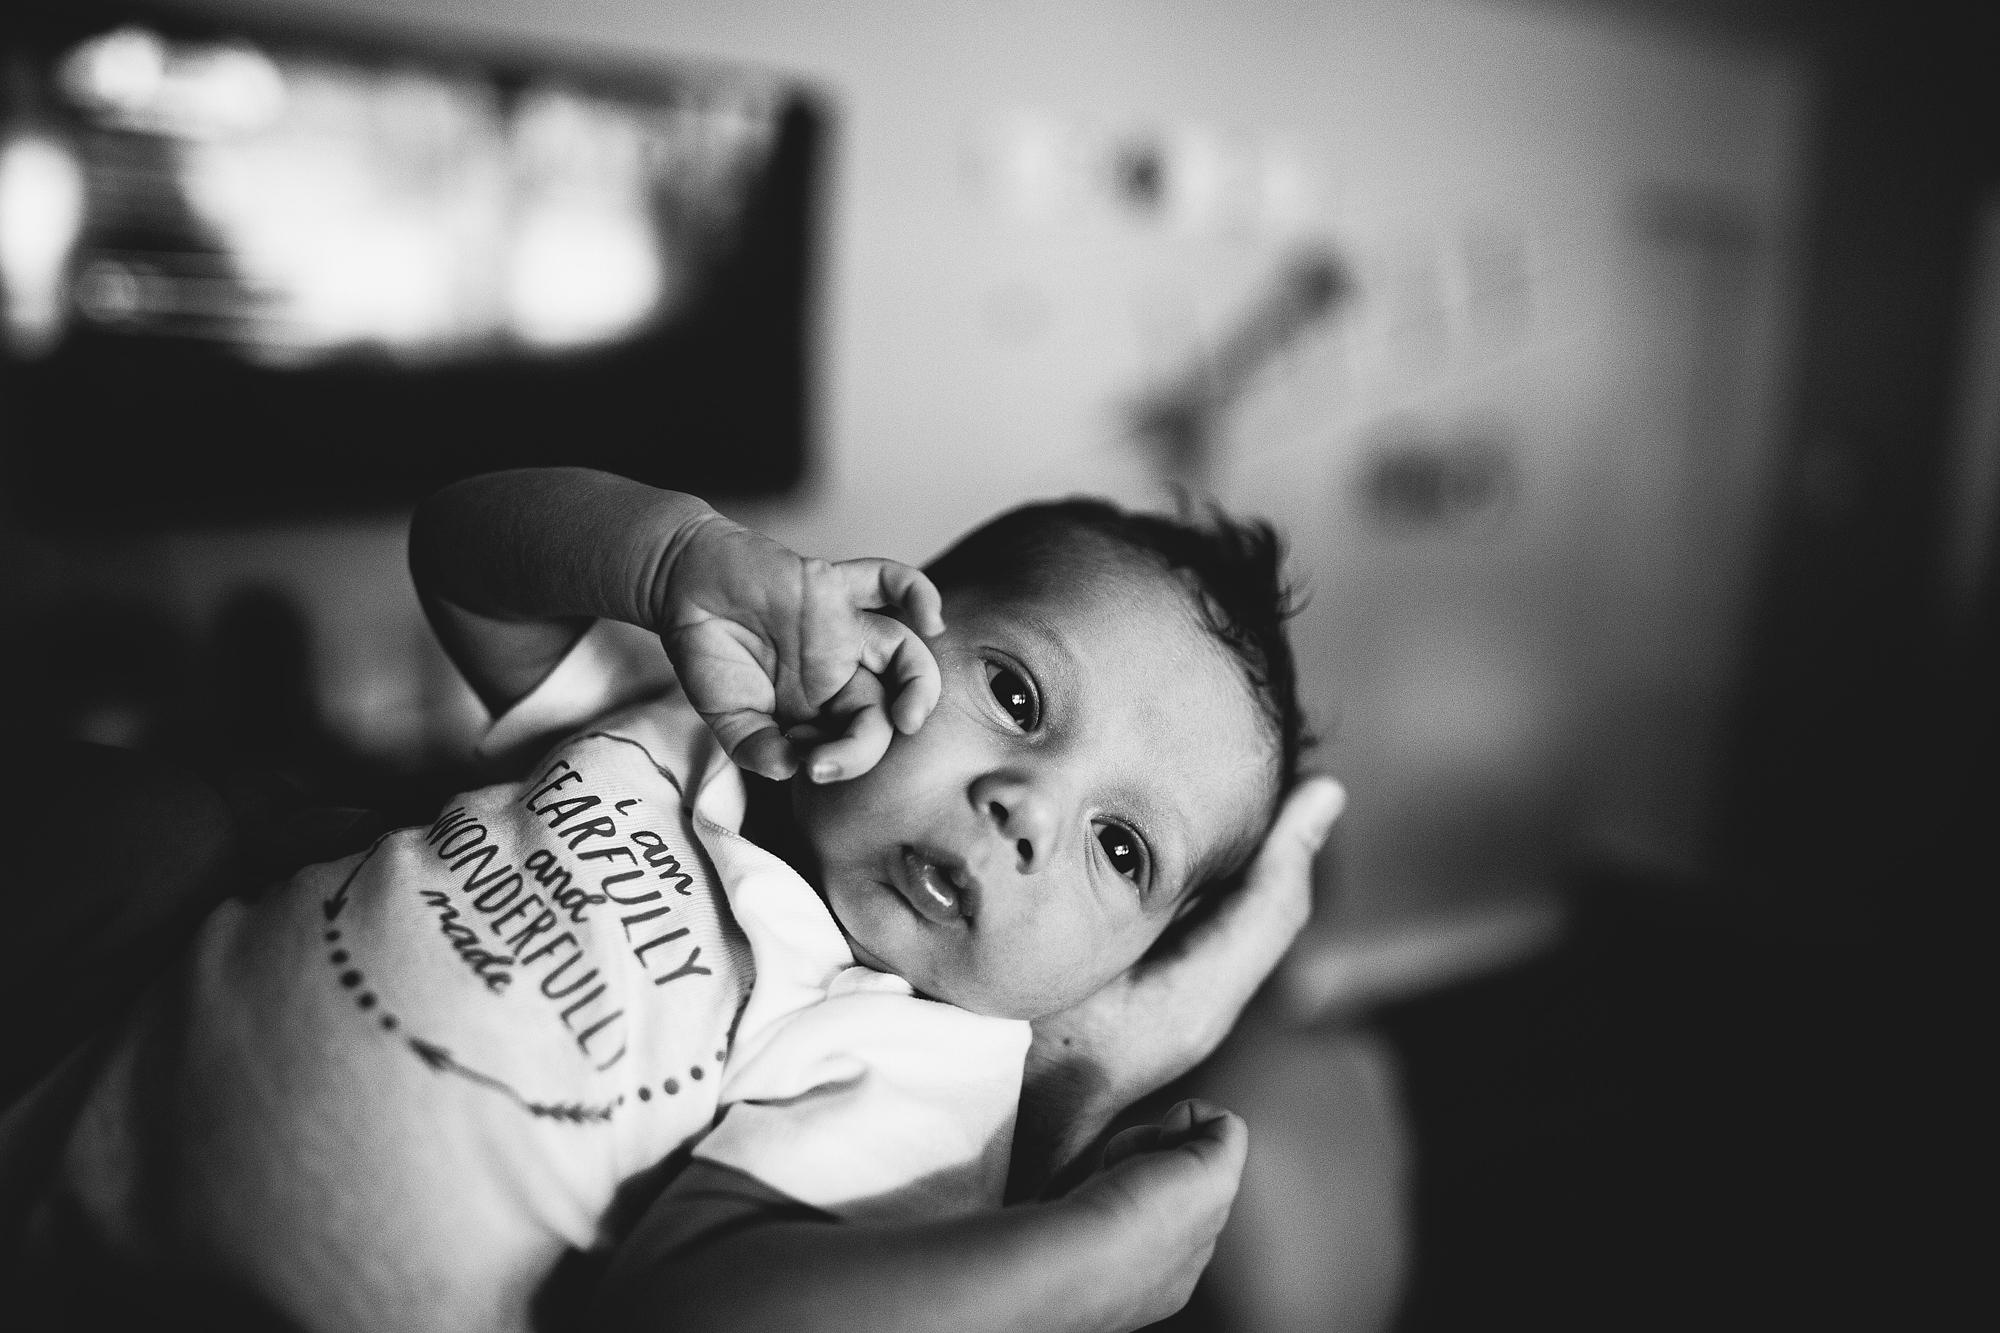 baby photoshoot at home, saint petersburg portrait photographer